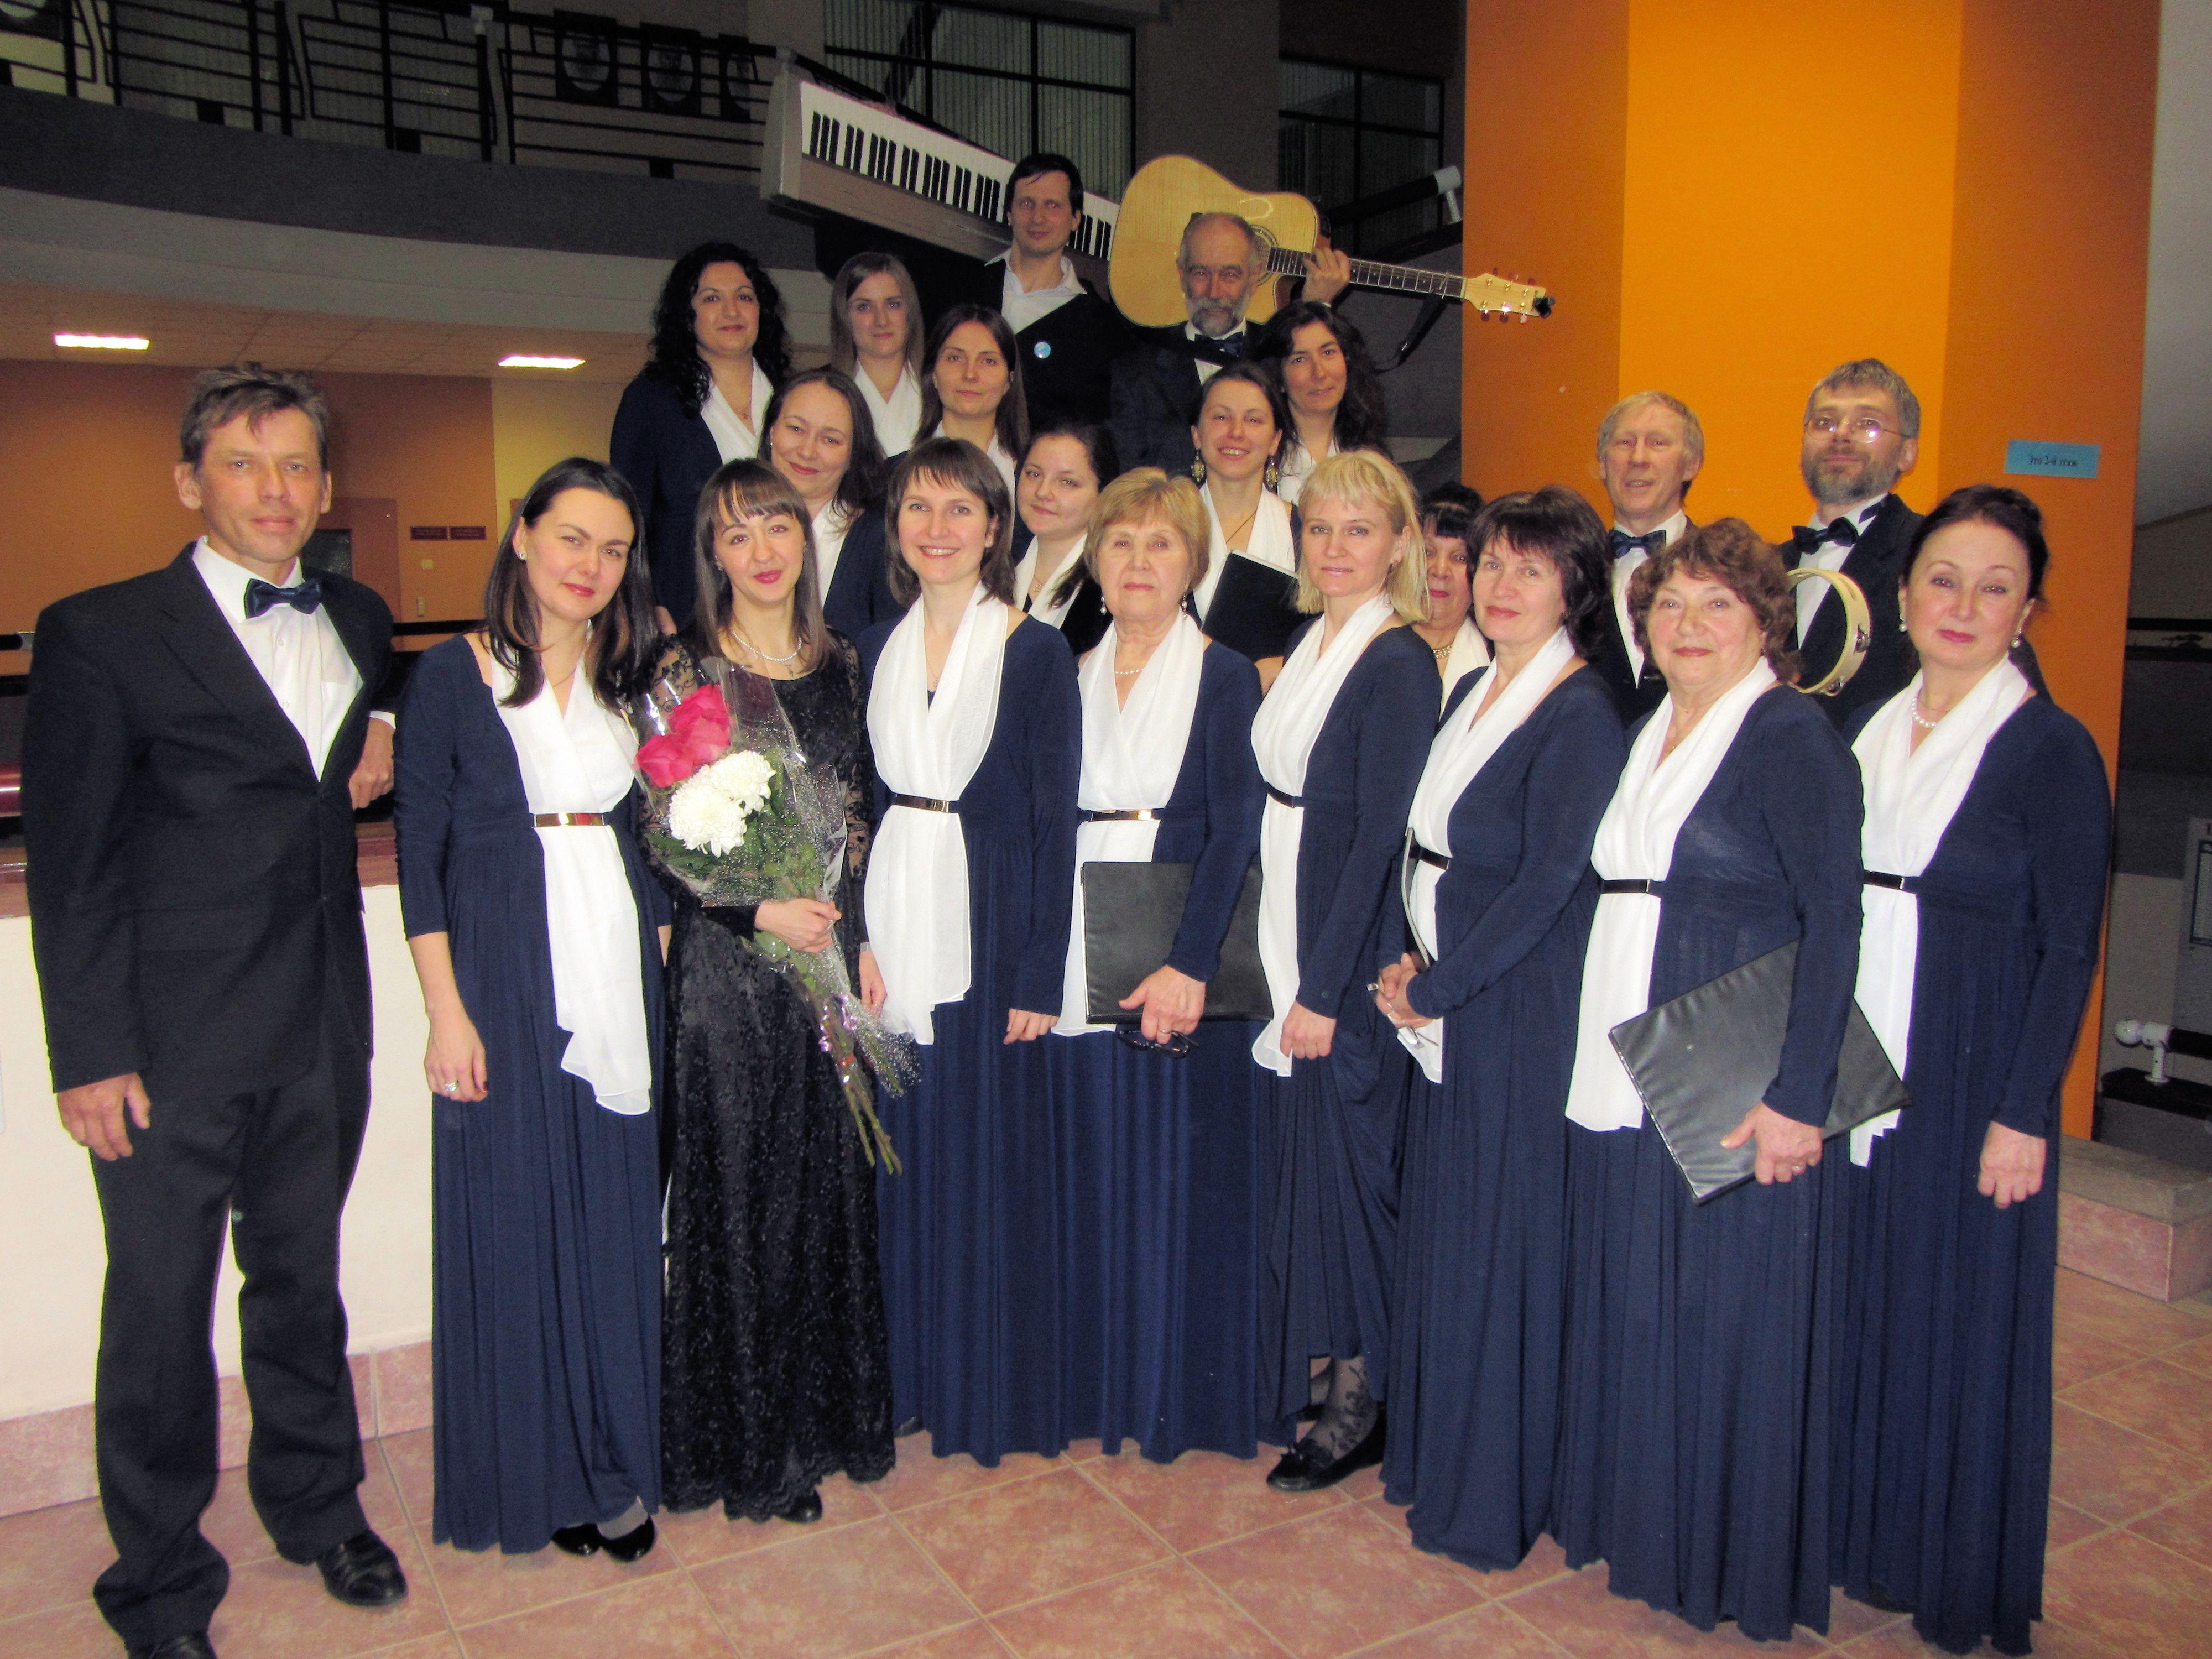 Chorus events